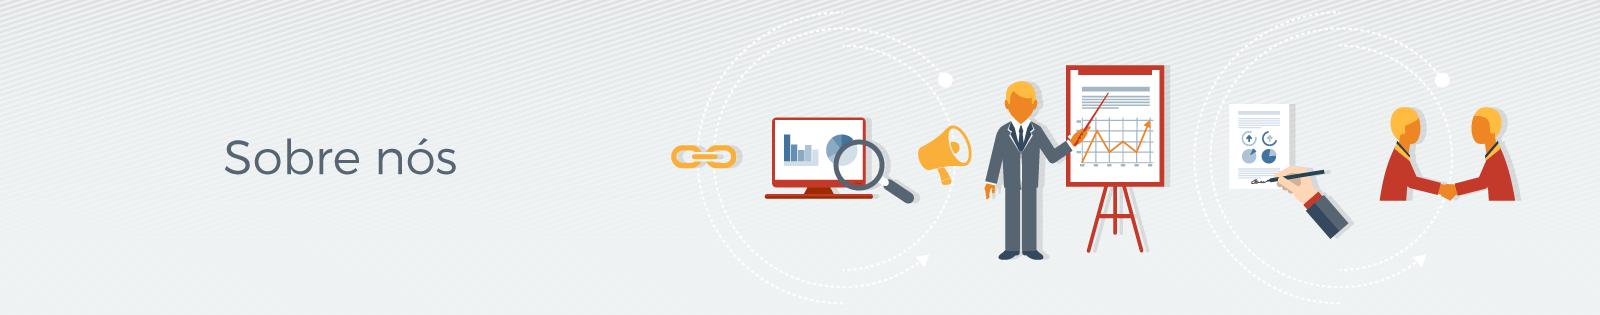 Marketing de resultados para empresas de TI